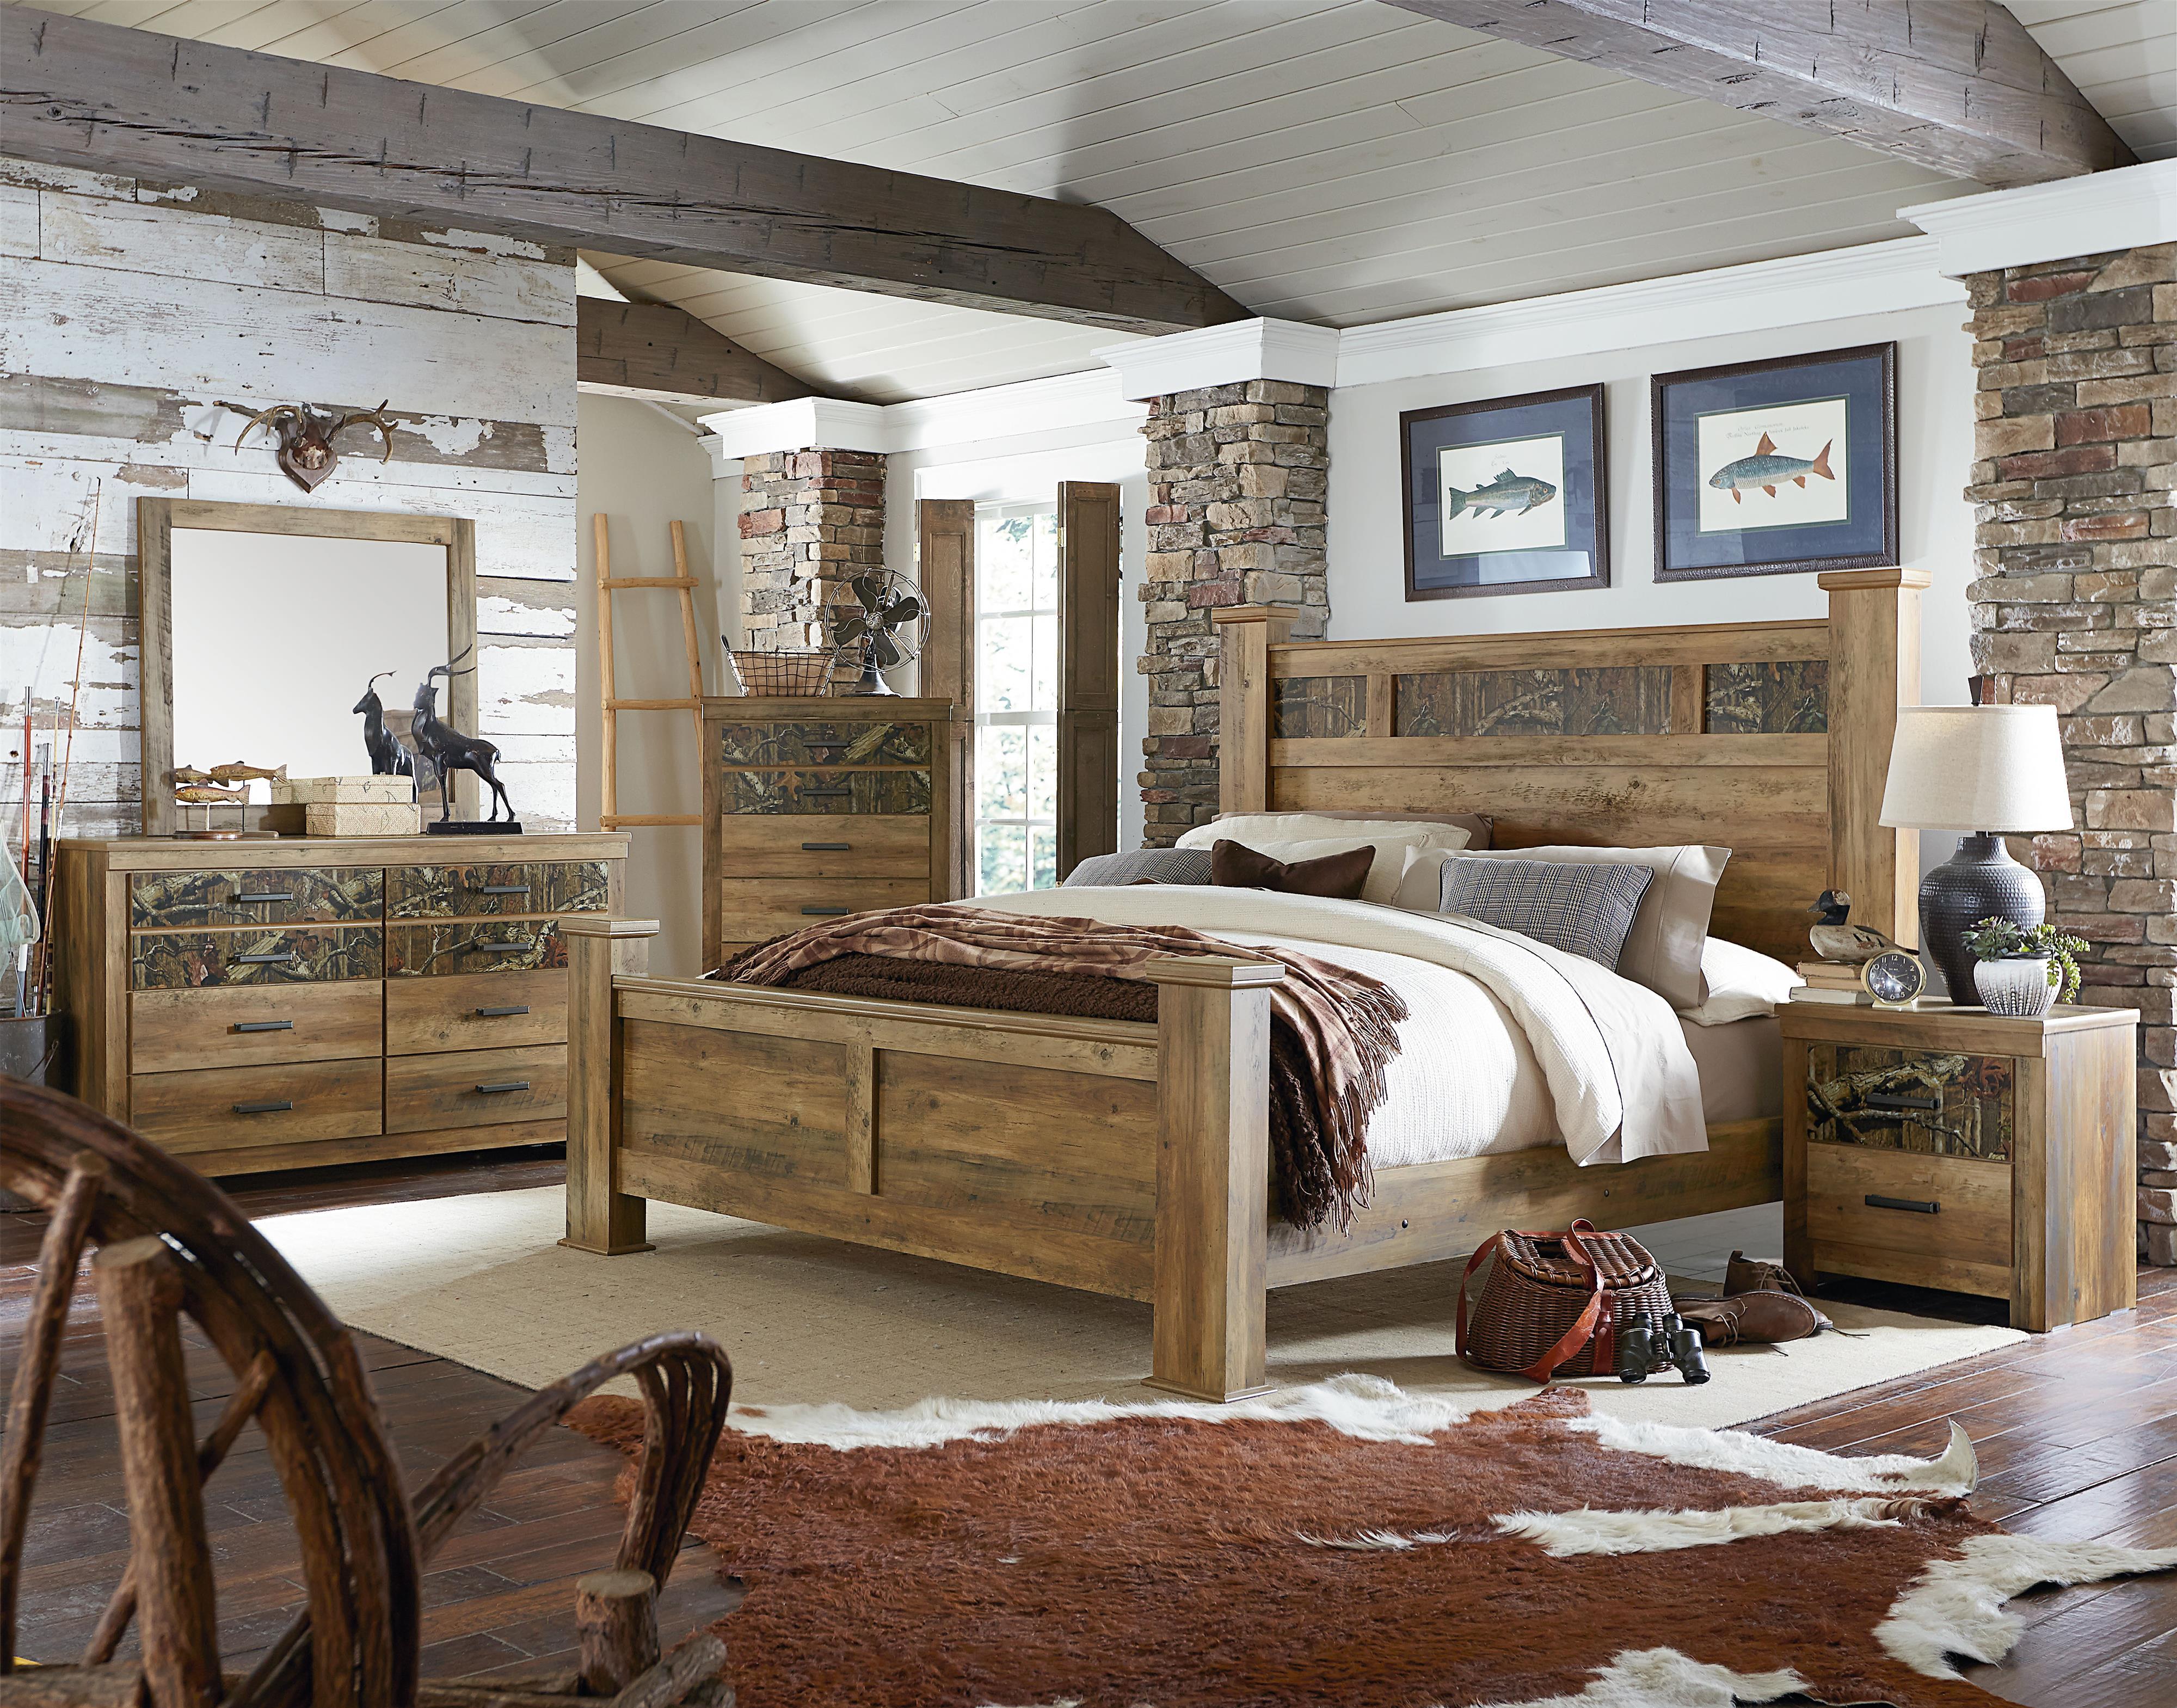 Standard Furniture Habitat Headboard With Camouflage Print Panel | Wayside  Furniture | Headboard